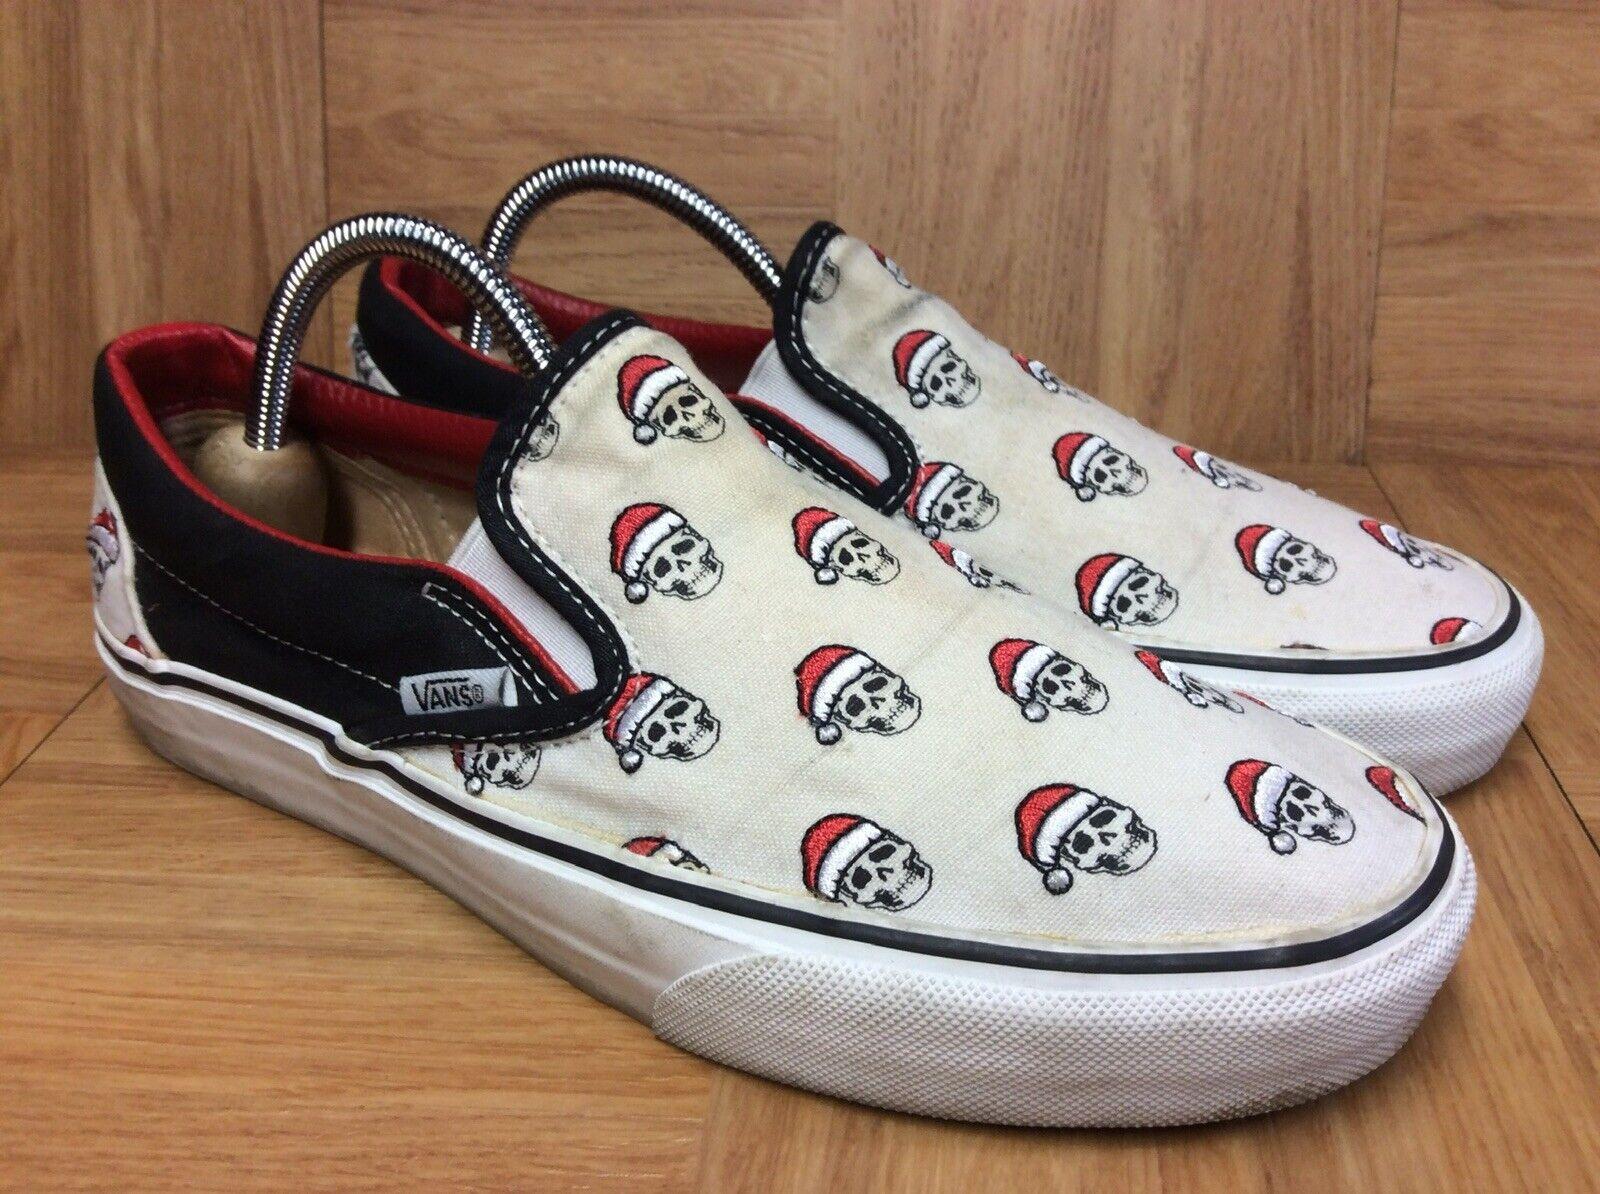 RARE VANS Classic Slip On Santa Skull Clause Sz 7 Men's - 8.5 Women's shoes